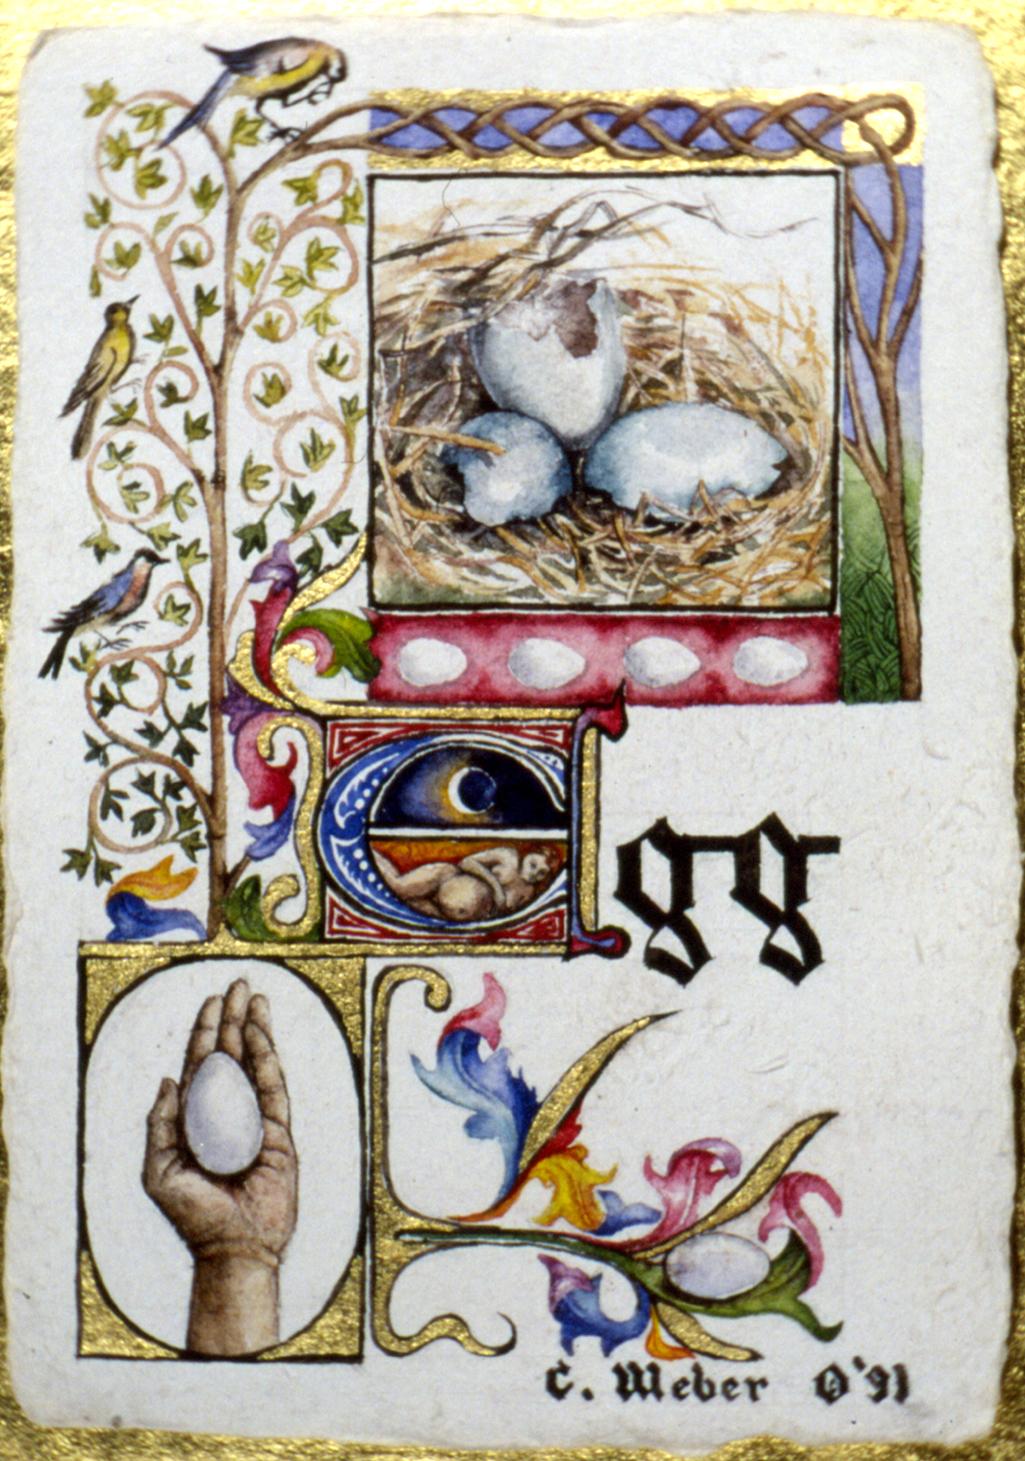 cathy weber - art - illumination - calligraphy - manuscript - watercolor - woman - egg - montana